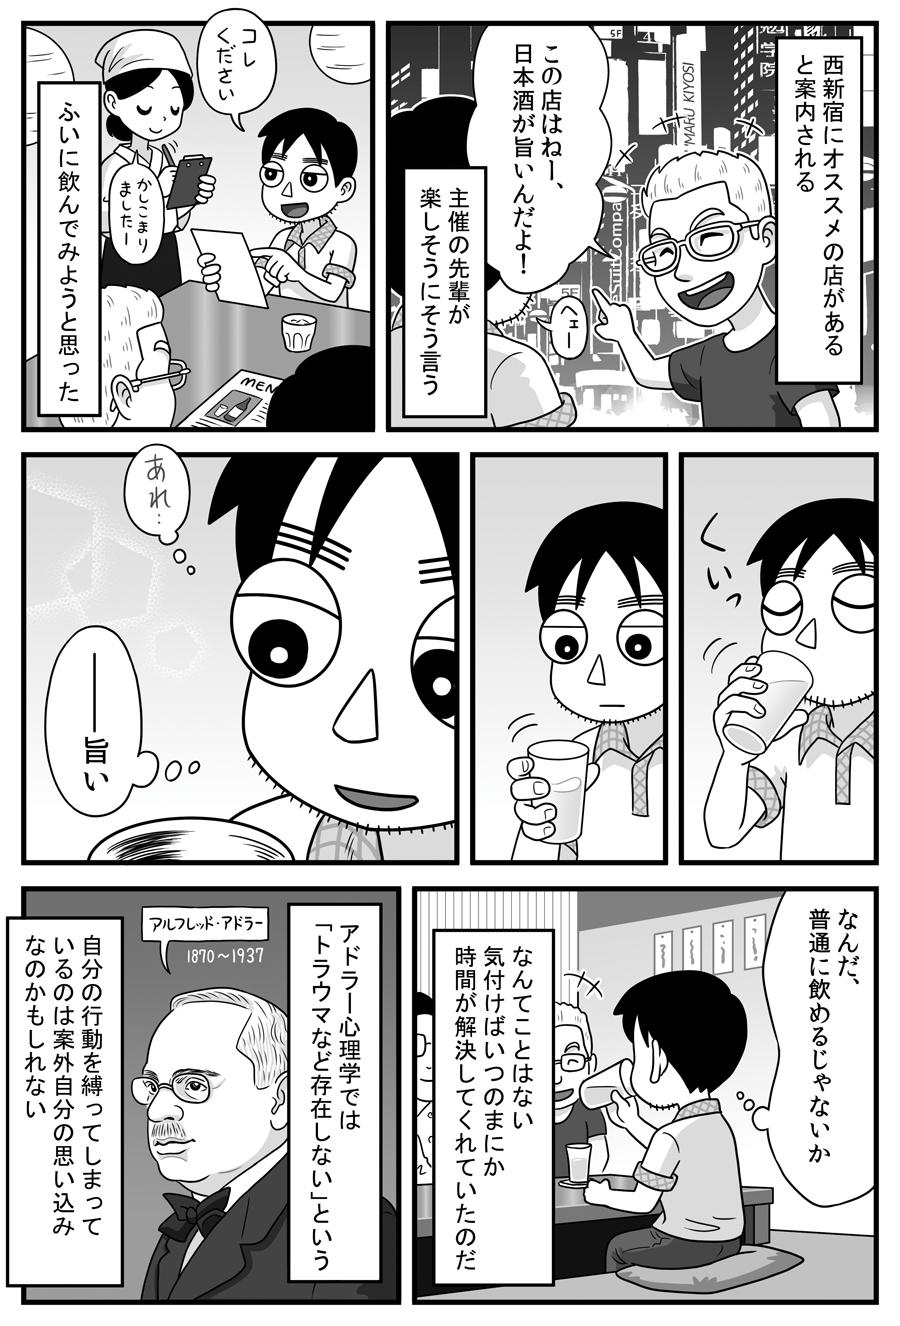 tokonokubo-b09-P05.jpg